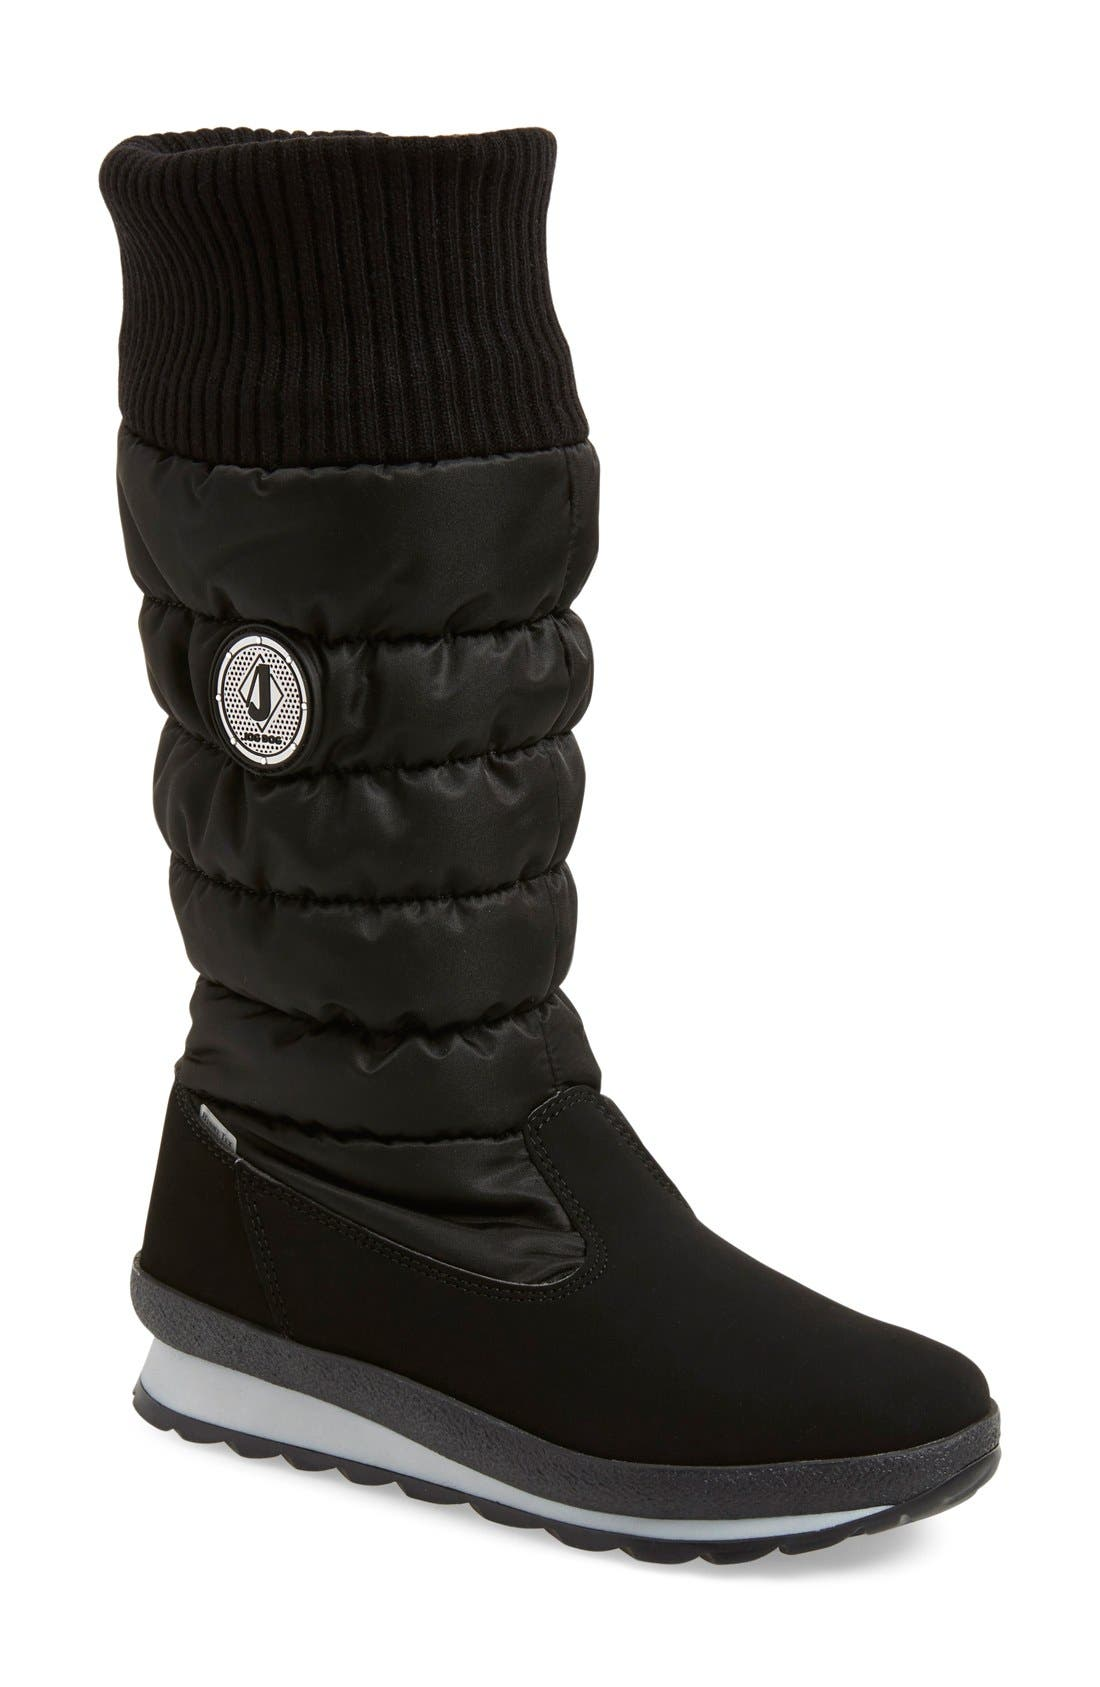 JOG DOG Waterproof Winter Boot